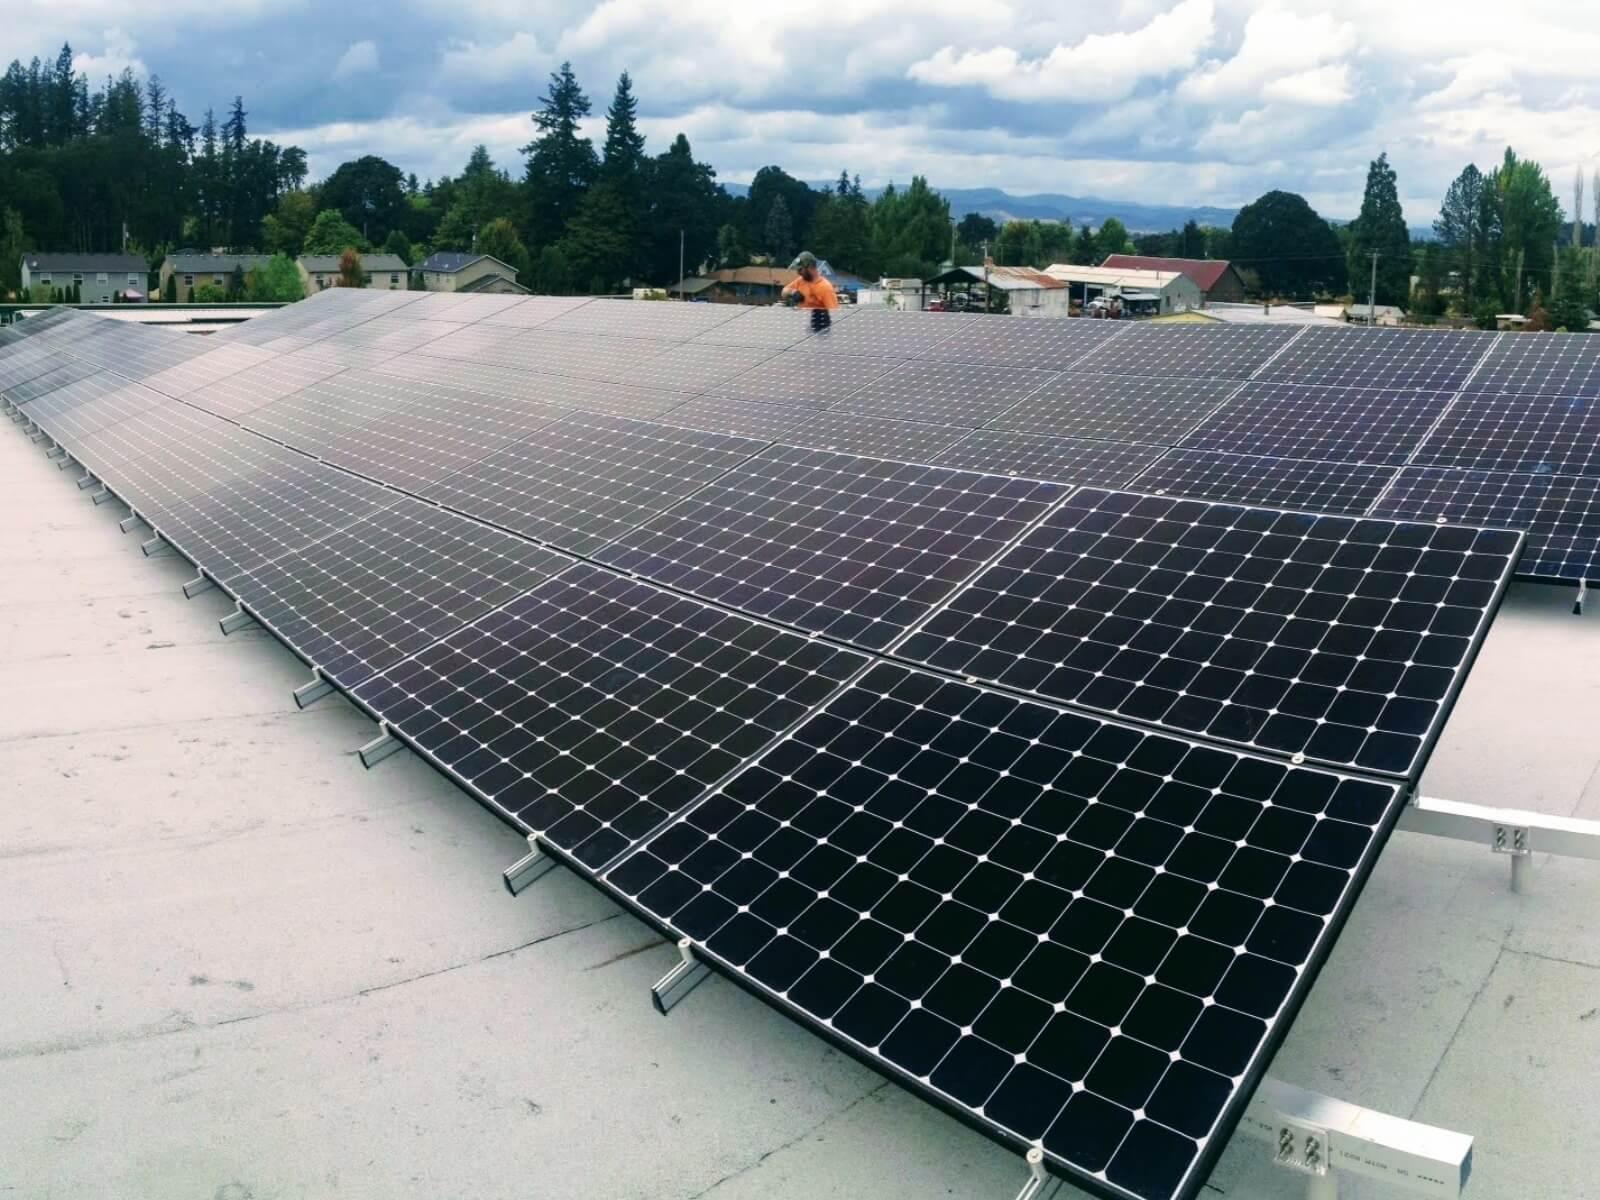 orecon business solar roof panels sunpower.jpeg